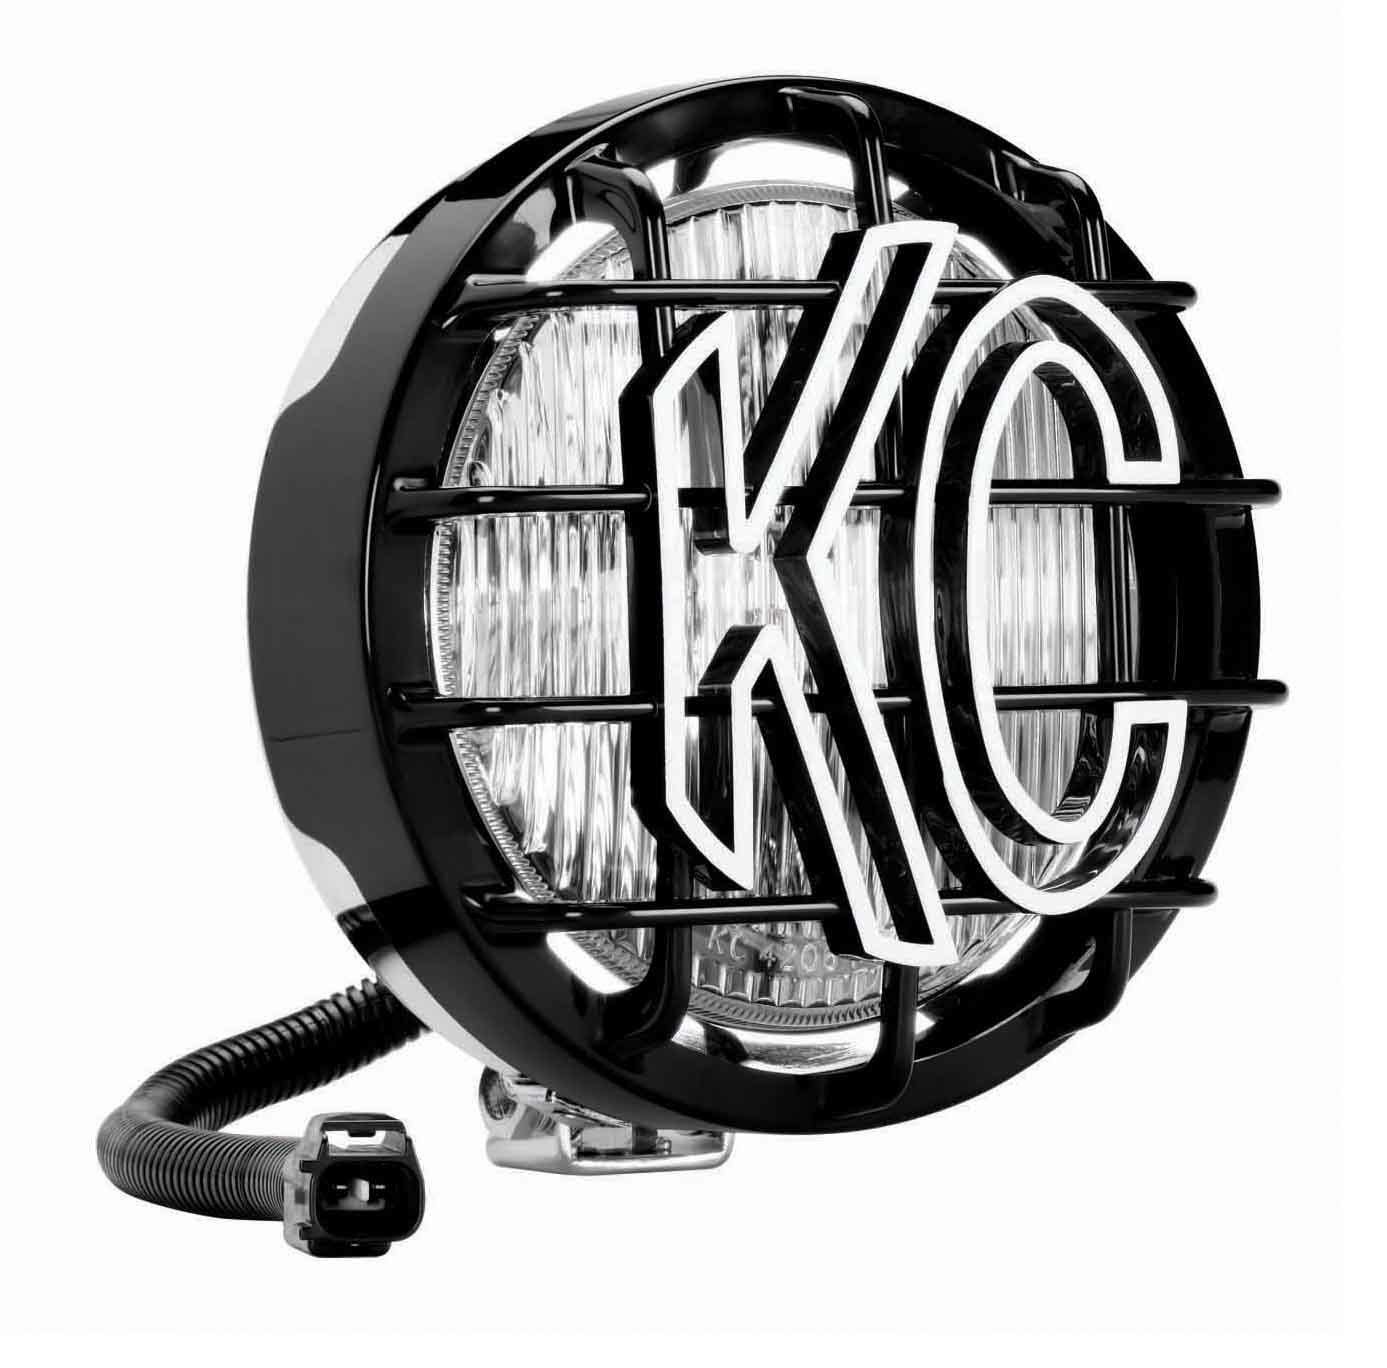 Kc hilites replacement fog light for 97 04 jeep wrangler tj unlimited quadratec